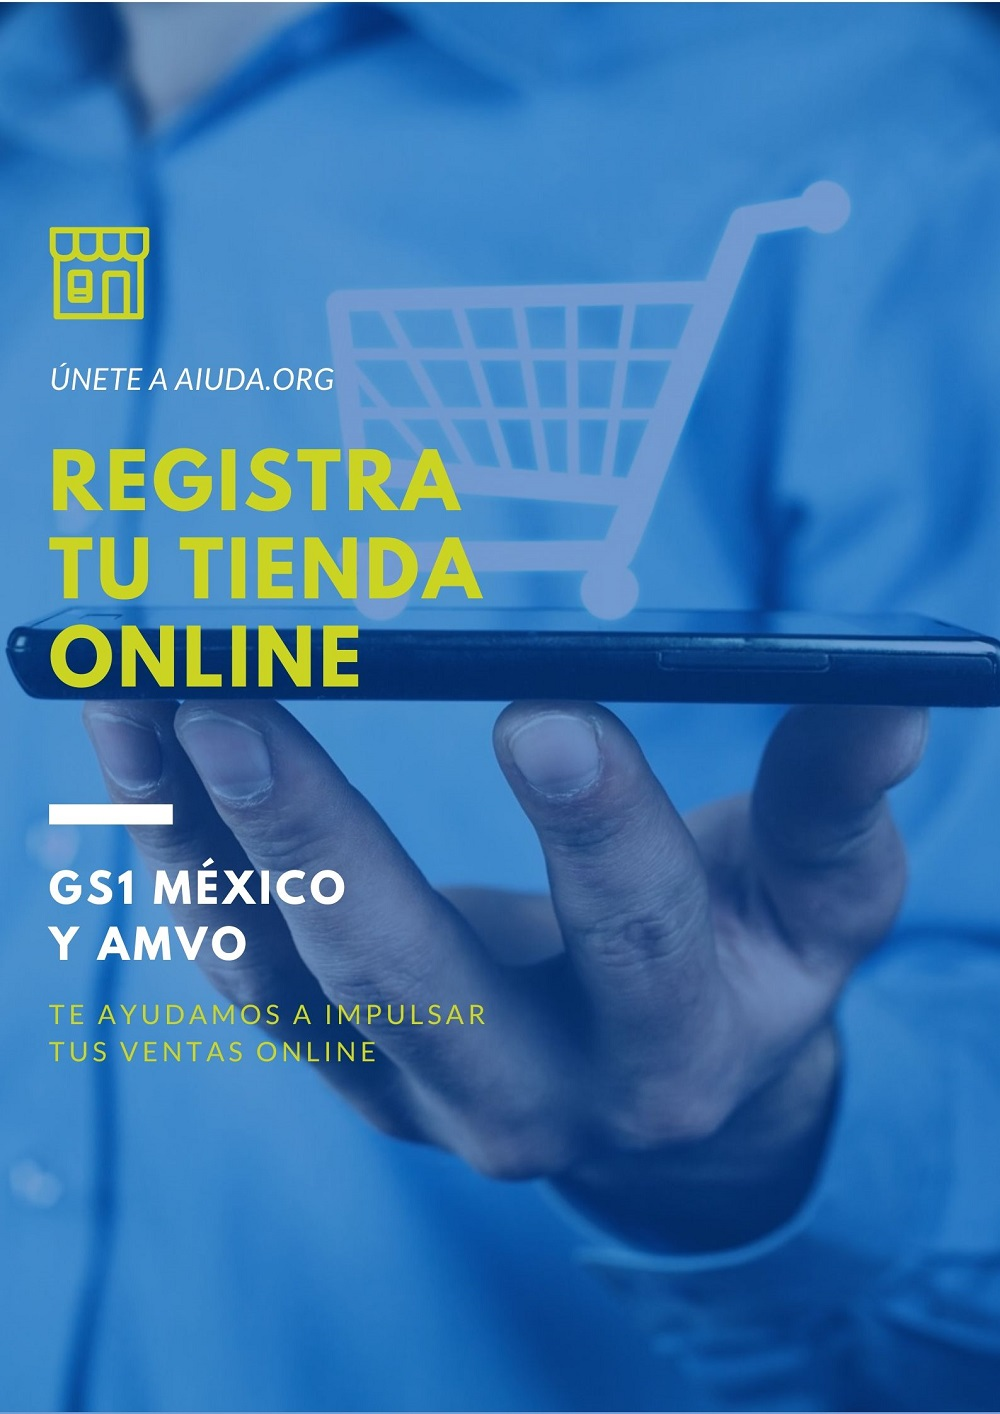 AMVO_GS1_MEXICO_AIUDA